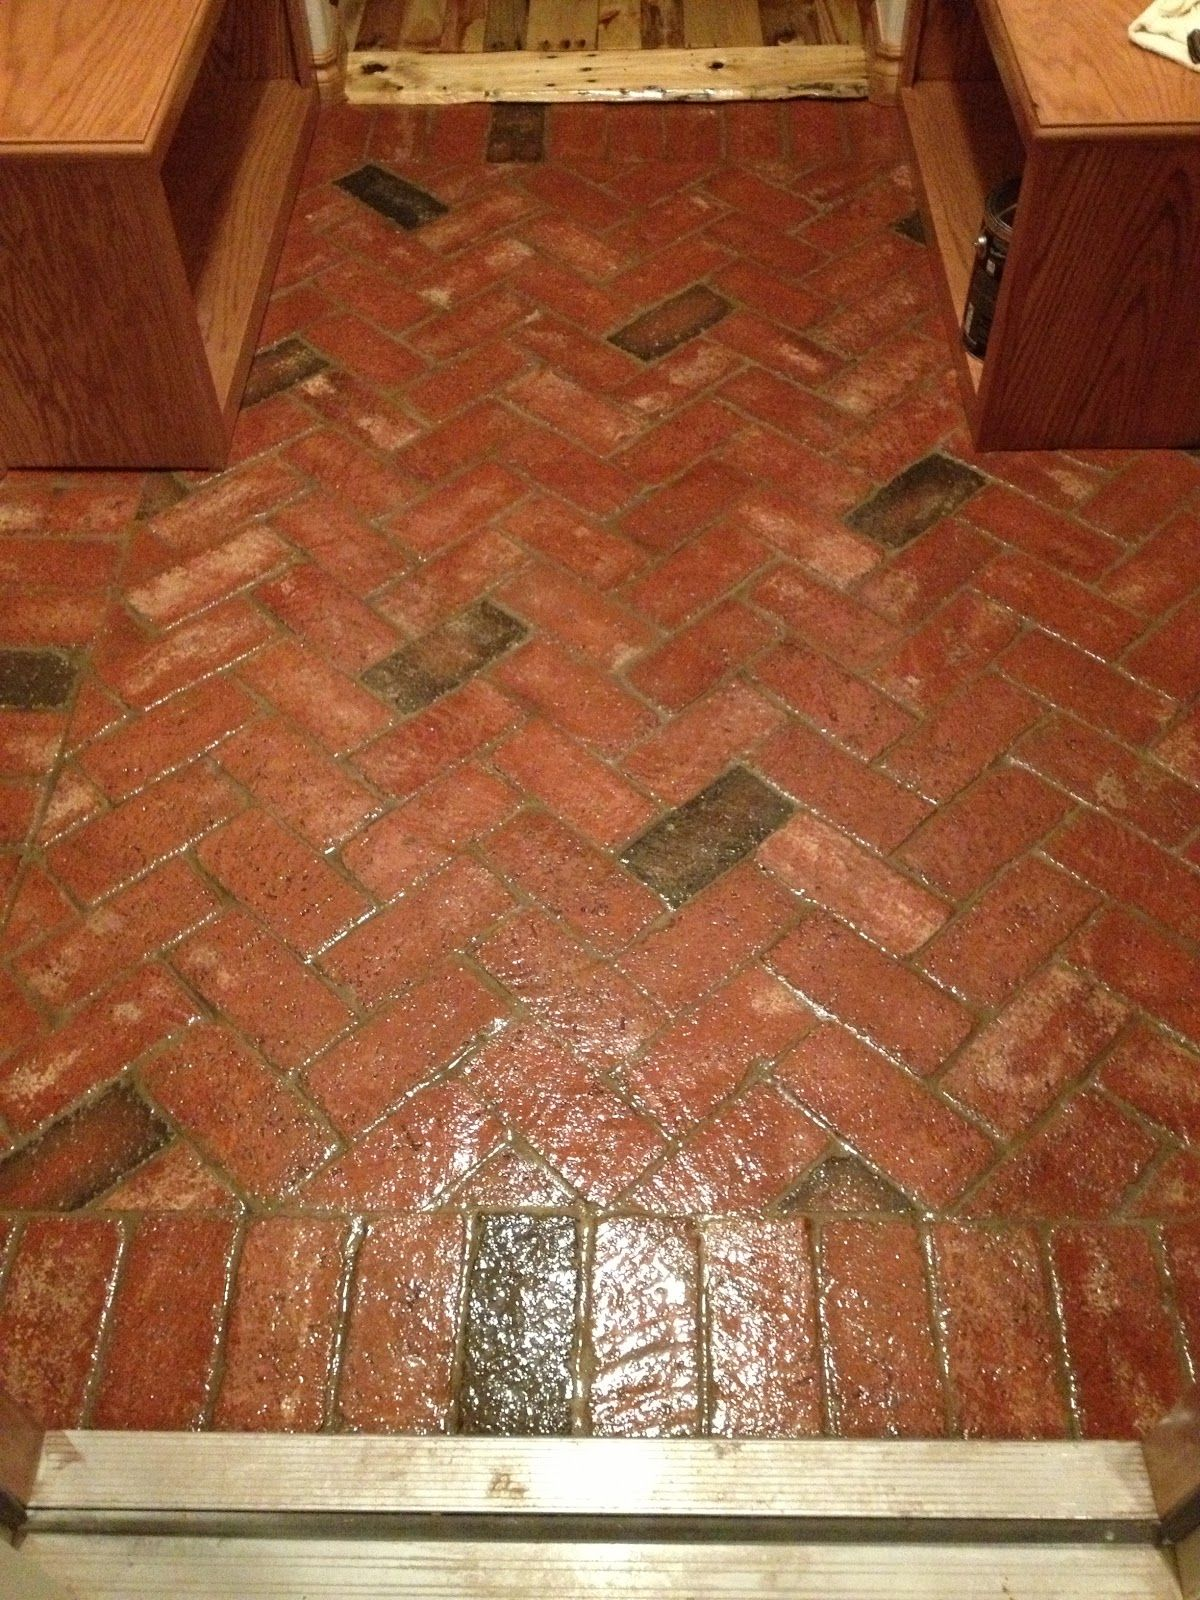 Sealed paver brick flooring abuildingweshallgospot rustic sealed paver brick flooring abuildingweshallgospot rustic home dcor ranch style dailygadgetfo Images